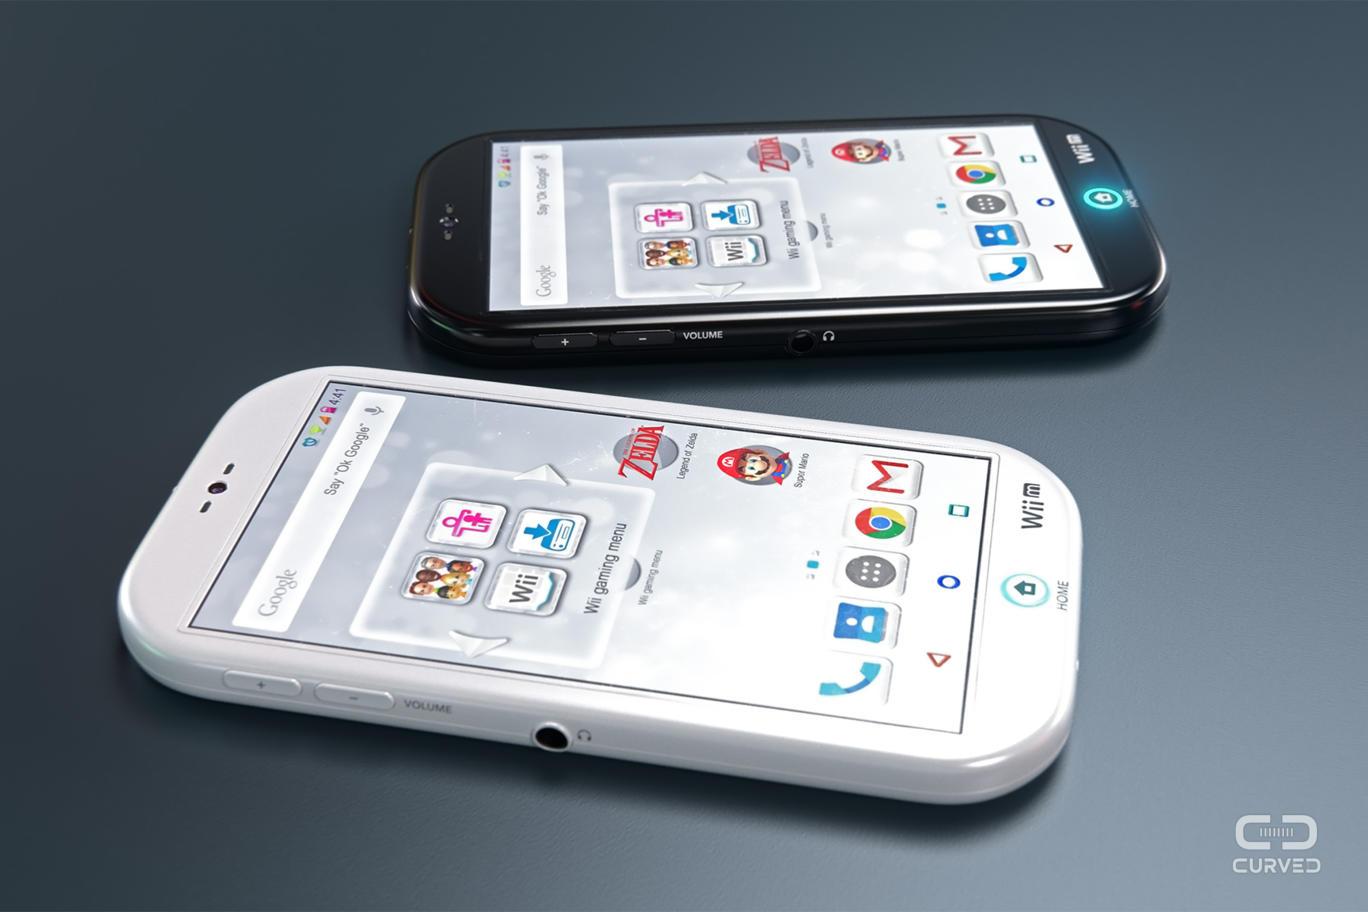 nintendo android, Concept : un smartphone Nintendo sous Android